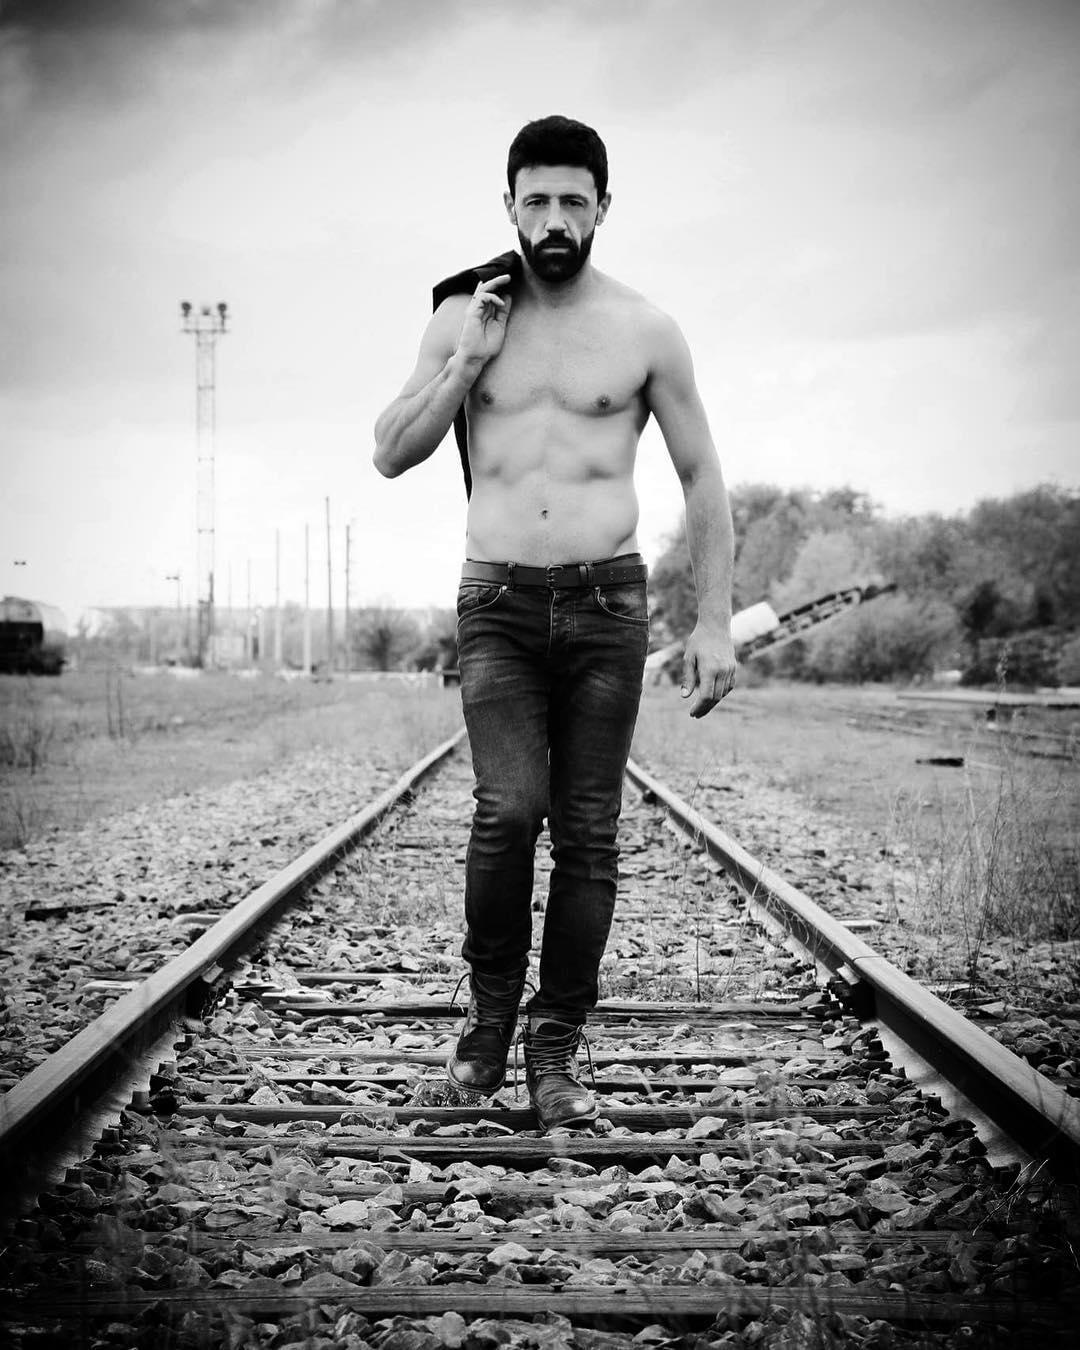 dams-steewood-photographie-instagram-01